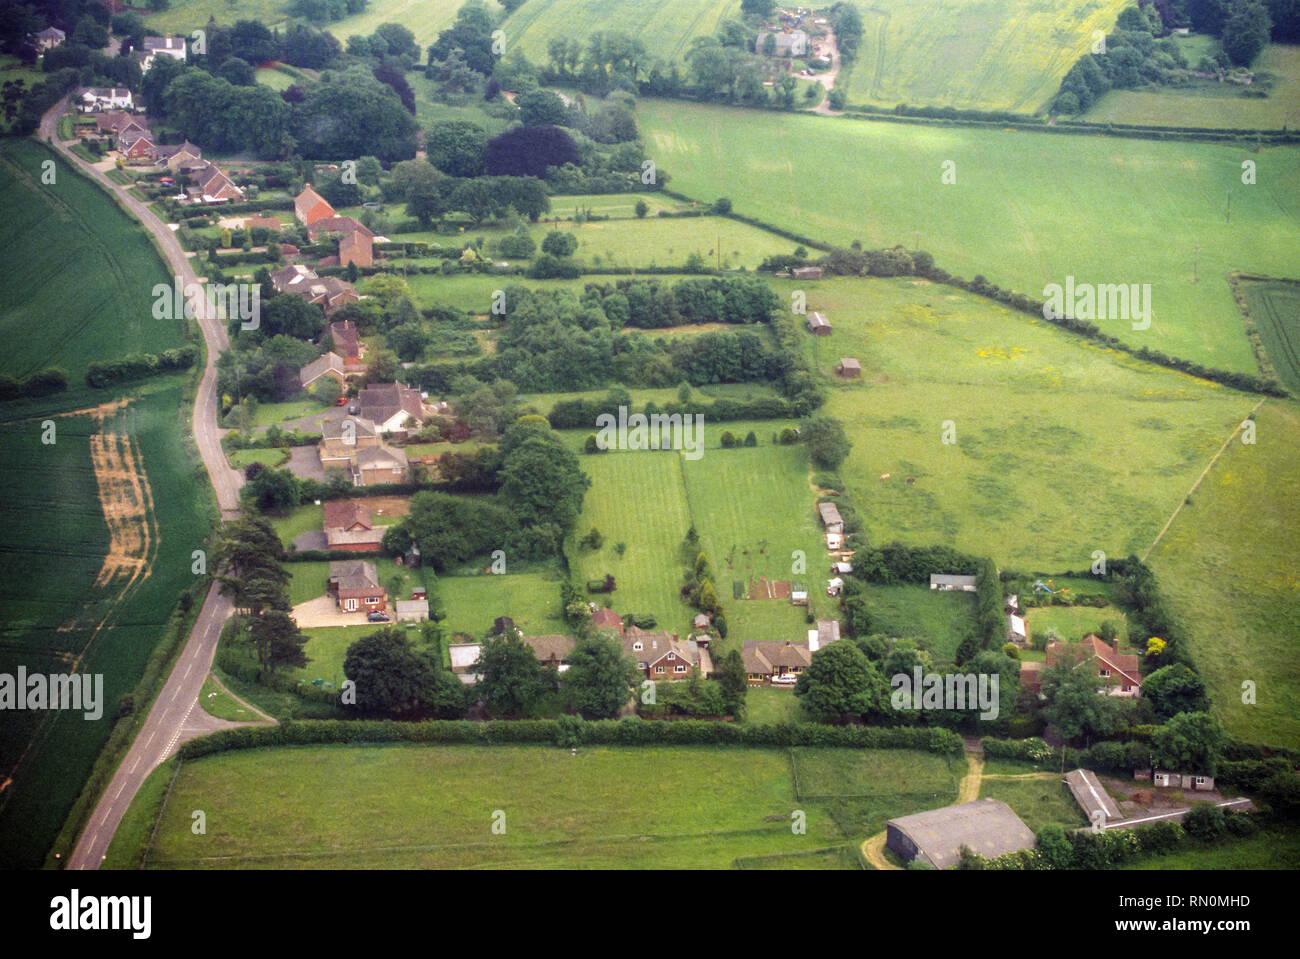 Aerial photograph of Wield Road, Medstead Village, Alton, Hampshire, England. United Kingdom. - Stock Image